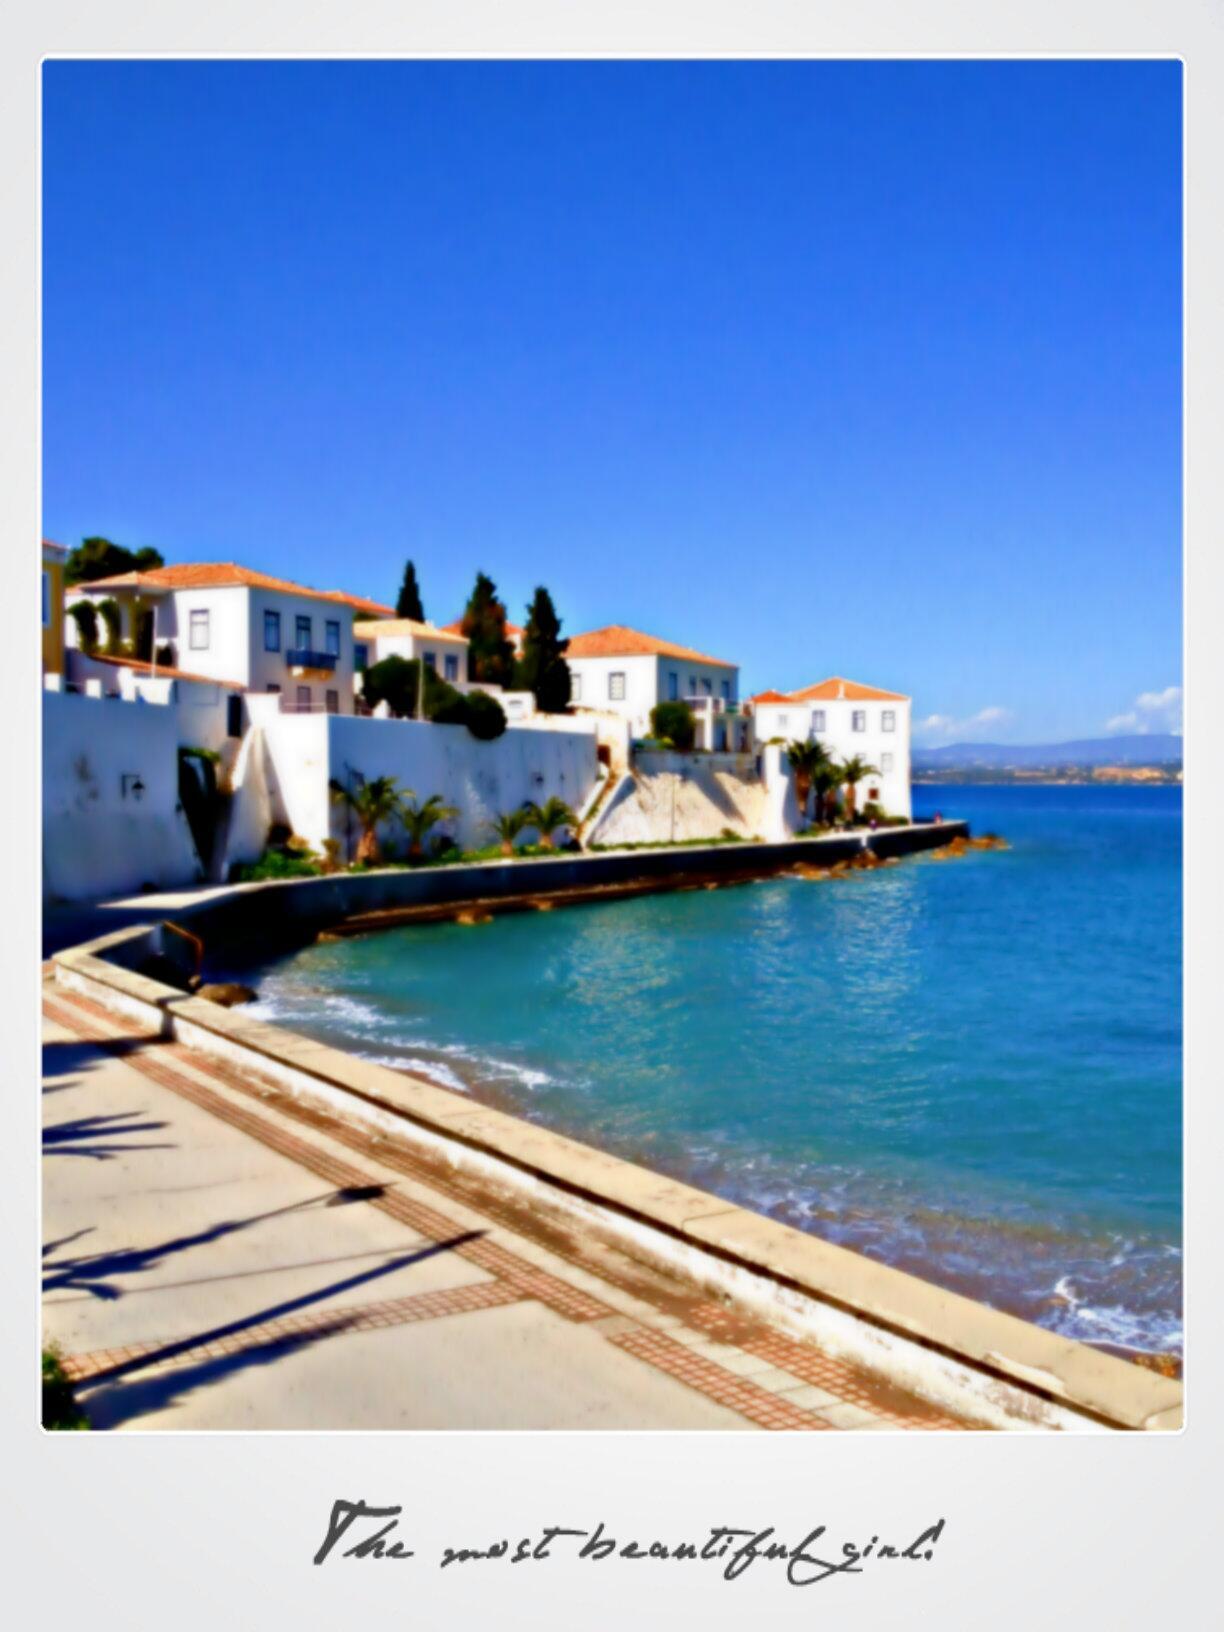 RT @ArmataHotel: Easter on Spetses Island!  #Greece @VisitGreecegr http://t.co/J97eeRmRL0